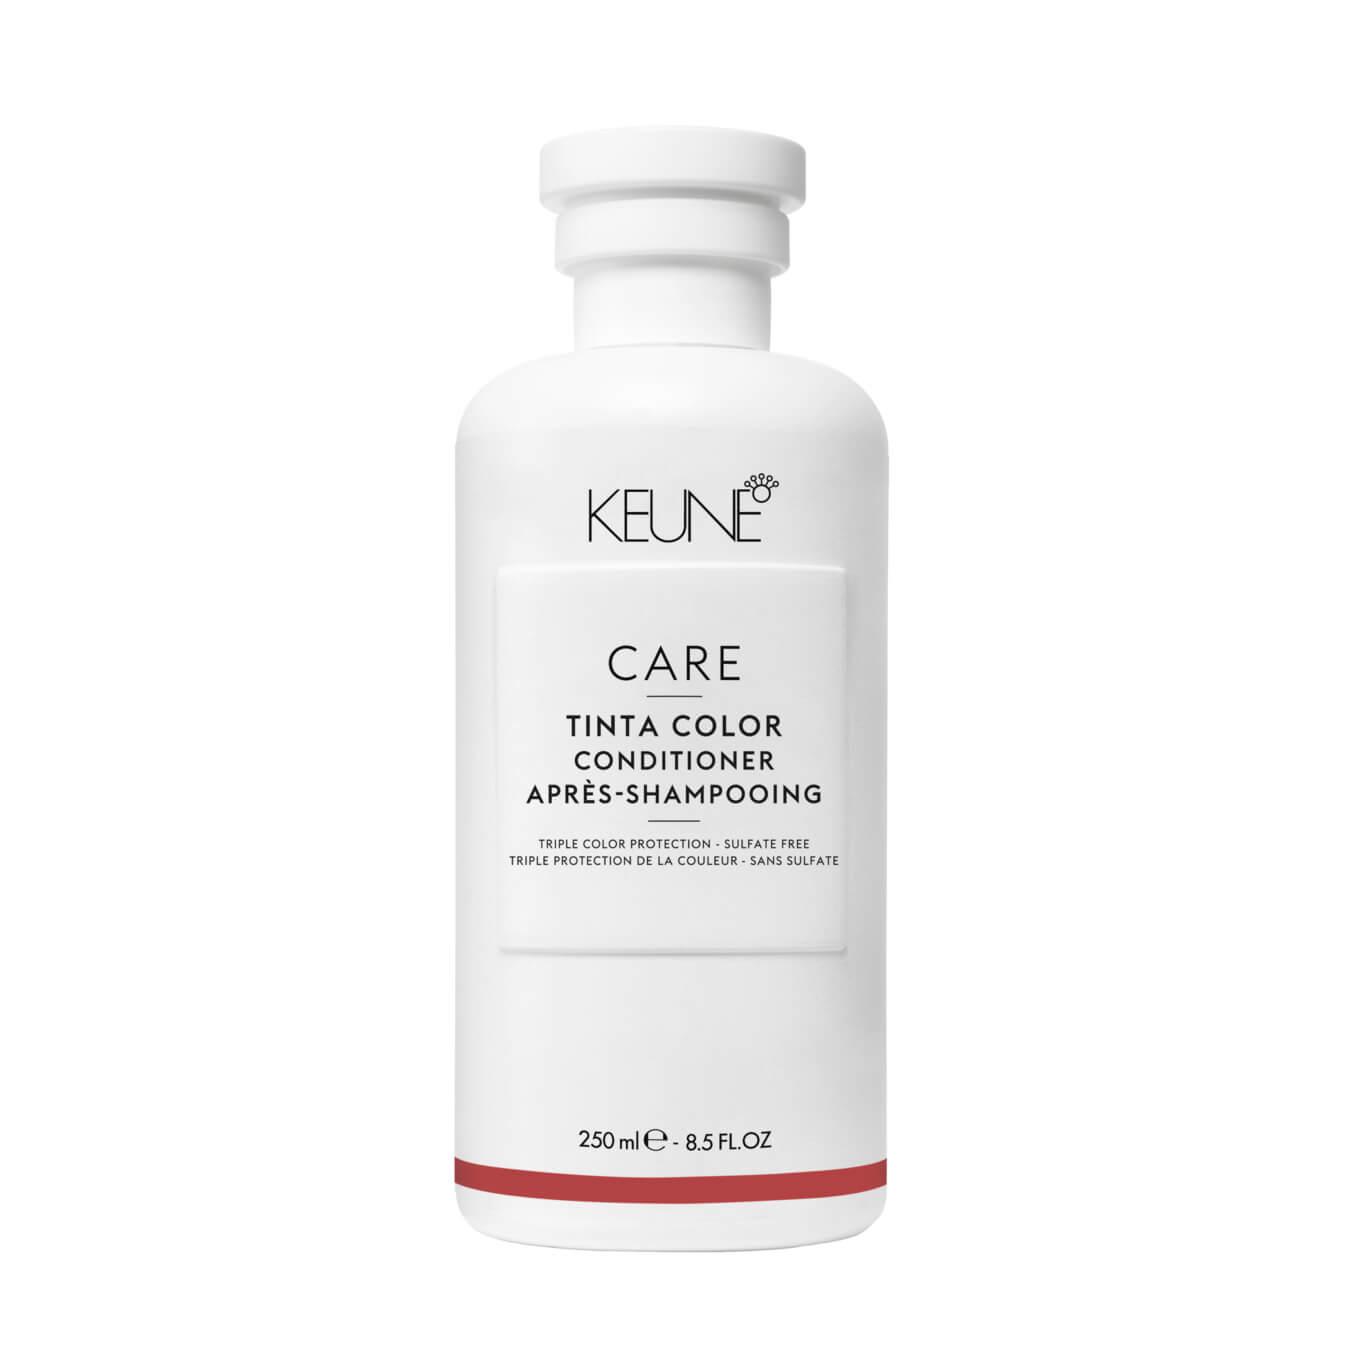 Kauf Keune Care Tinta Color Care Conditioner 250ml